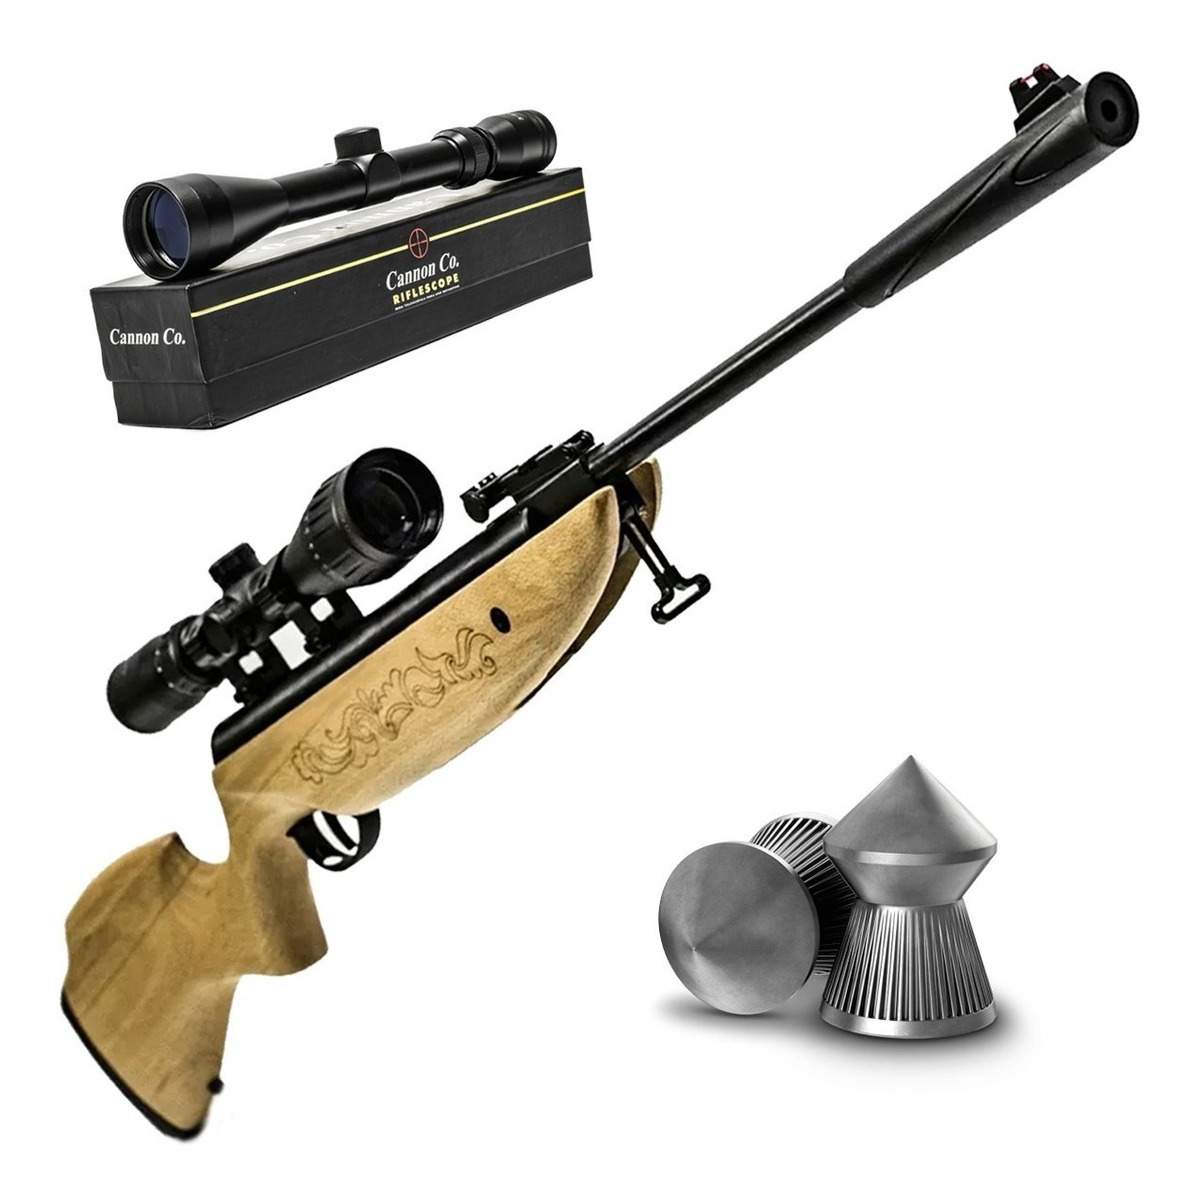 Rifle Nitro Piston Bam Mod B23-1 Cal 5 5mm Mira Zoom 3-9x40